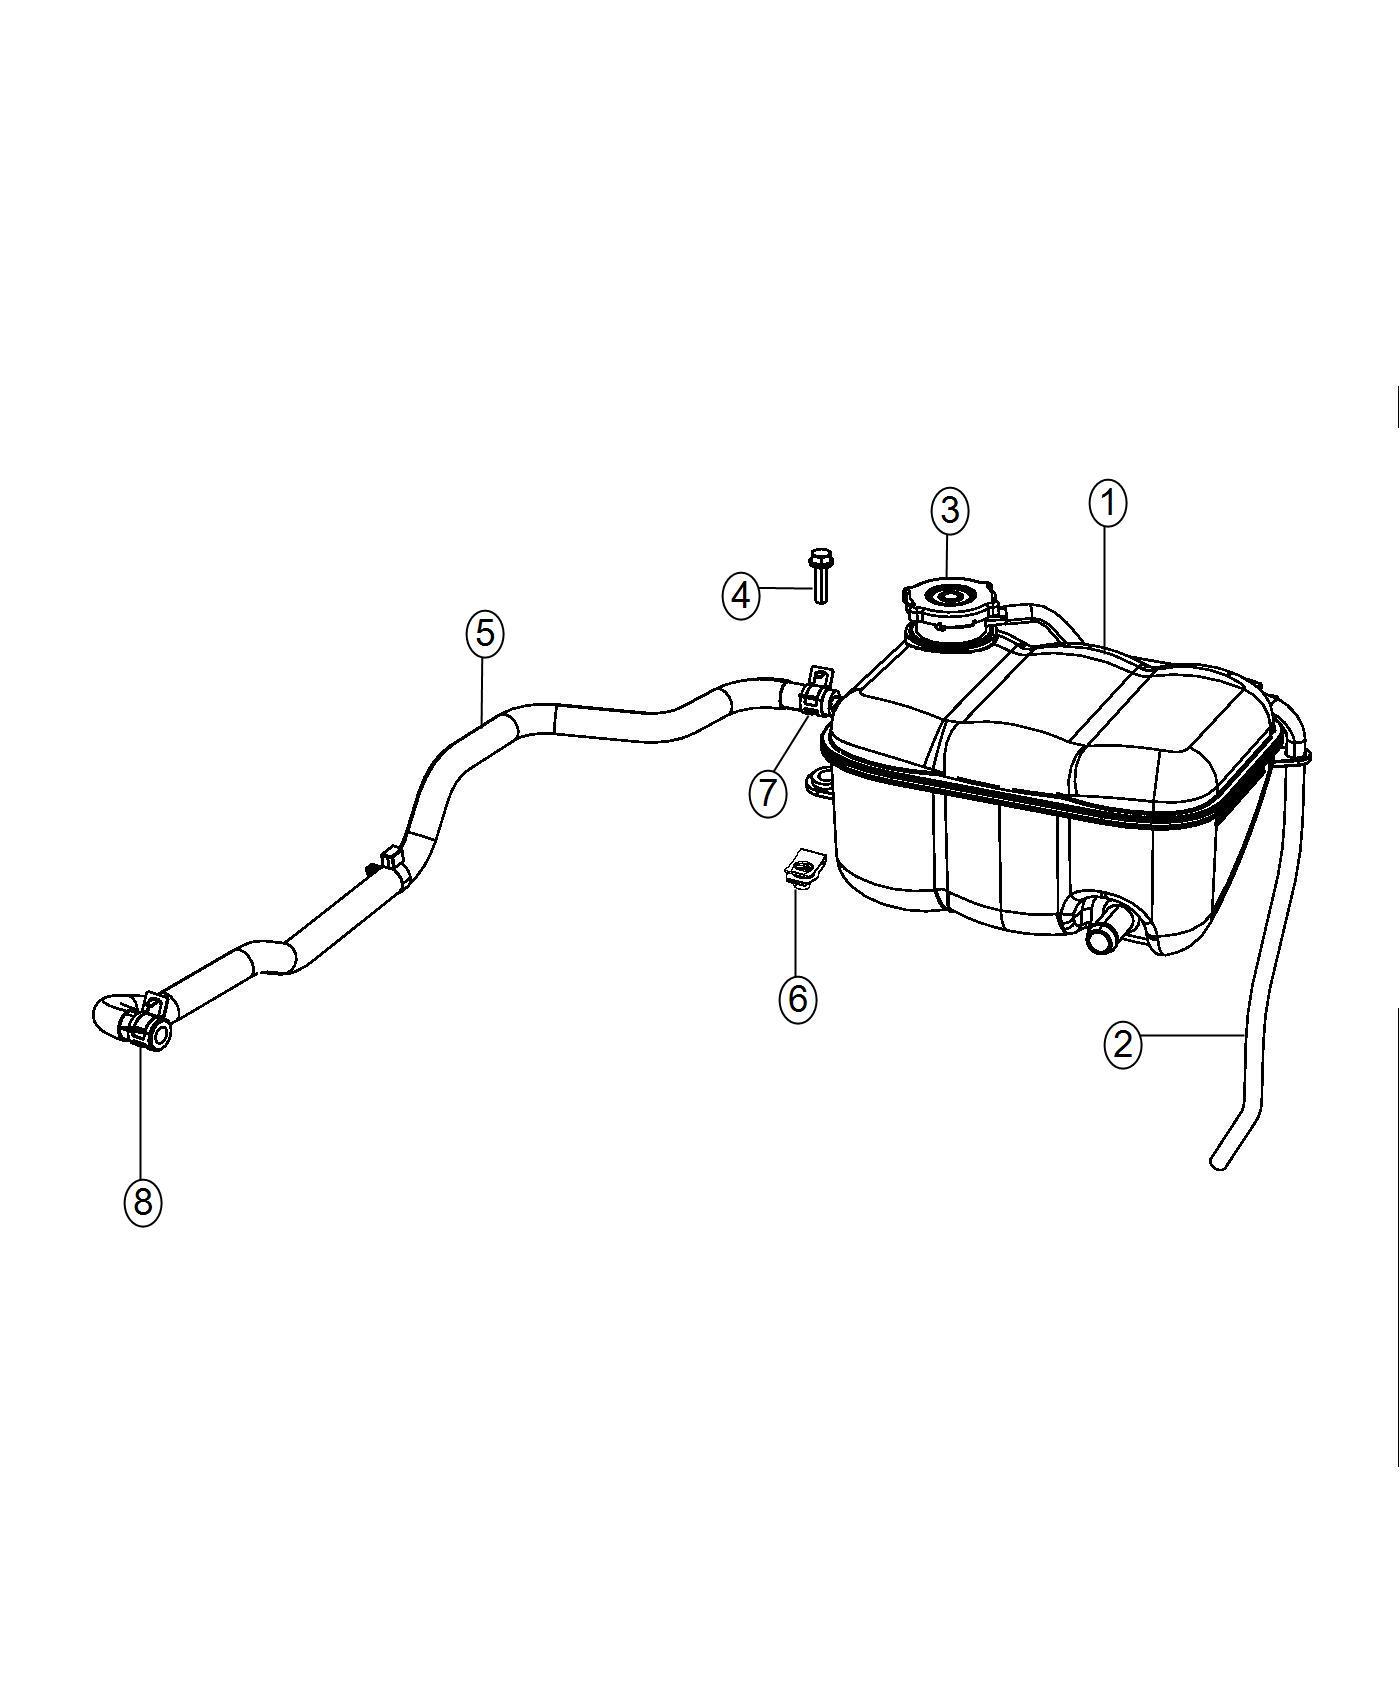 2017 dodge viper bottle  pressurized coolant  includes cap and over flow hose